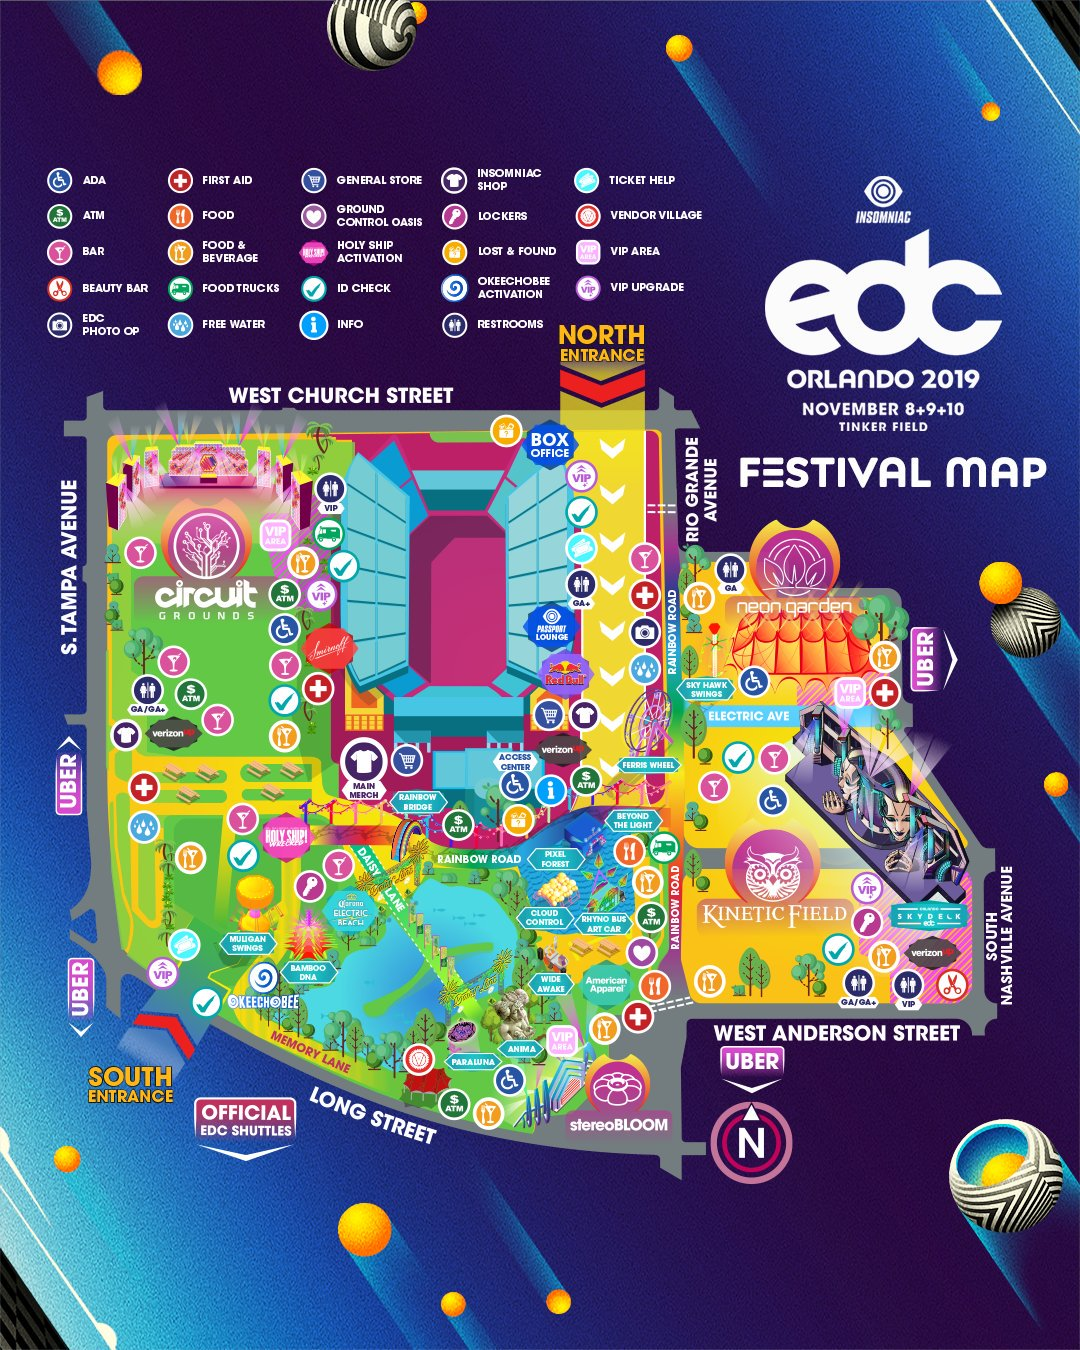 EDC Orlando 2019 Festival Map